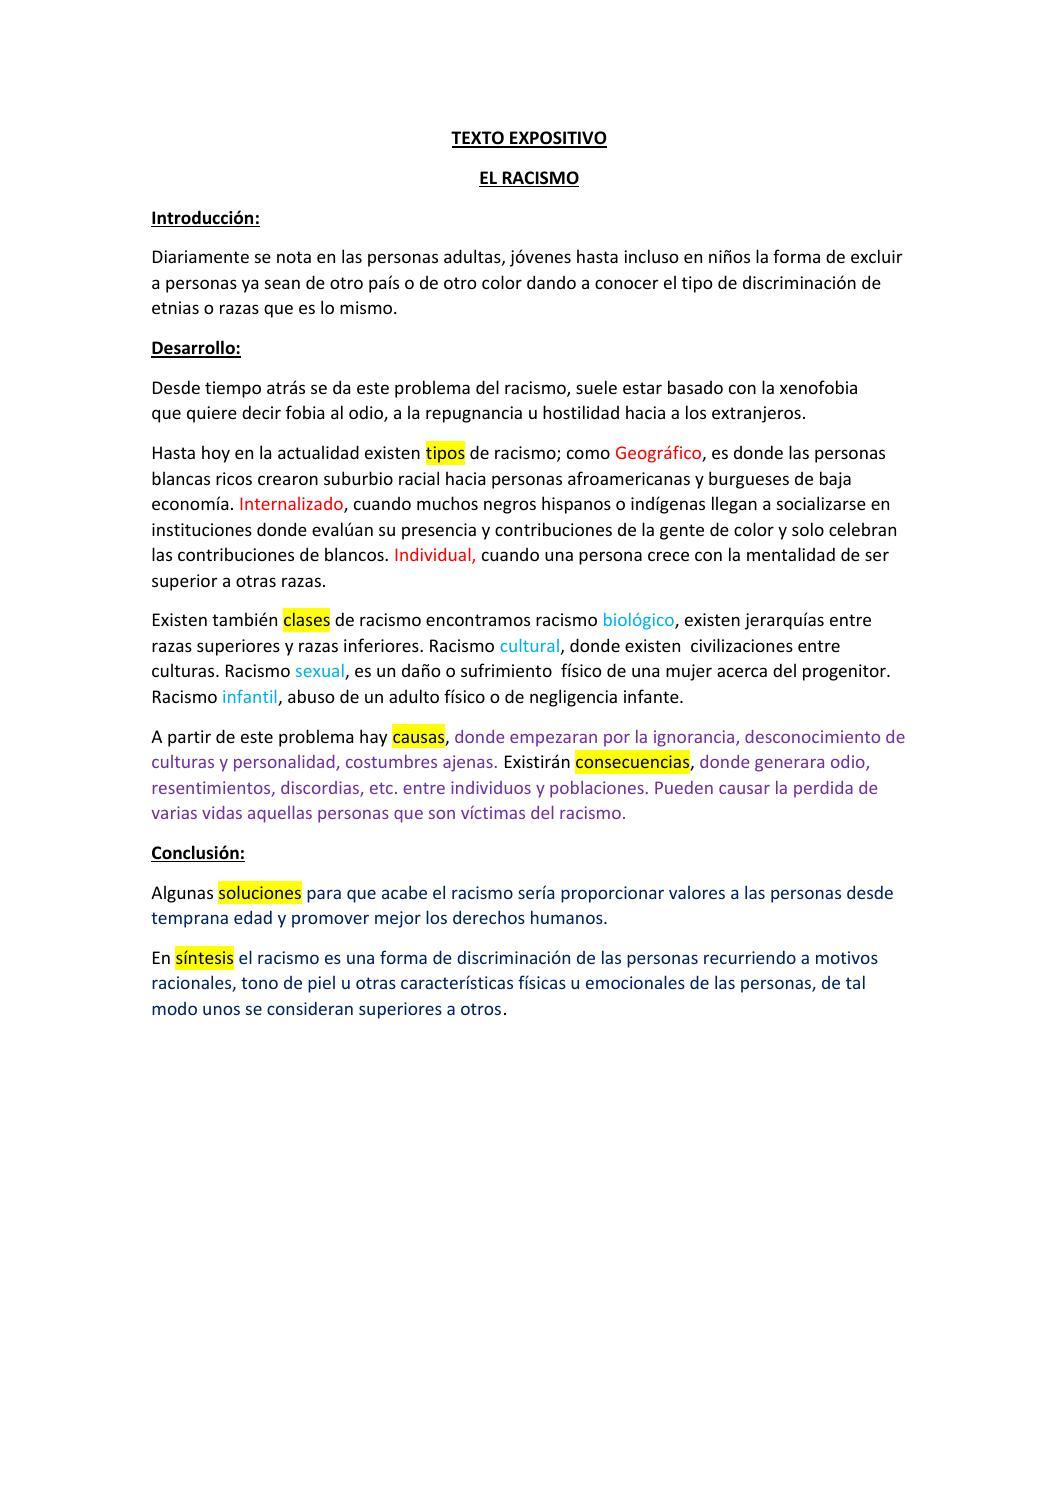 Texto Expositivo El Racismo By Chucho Issuu